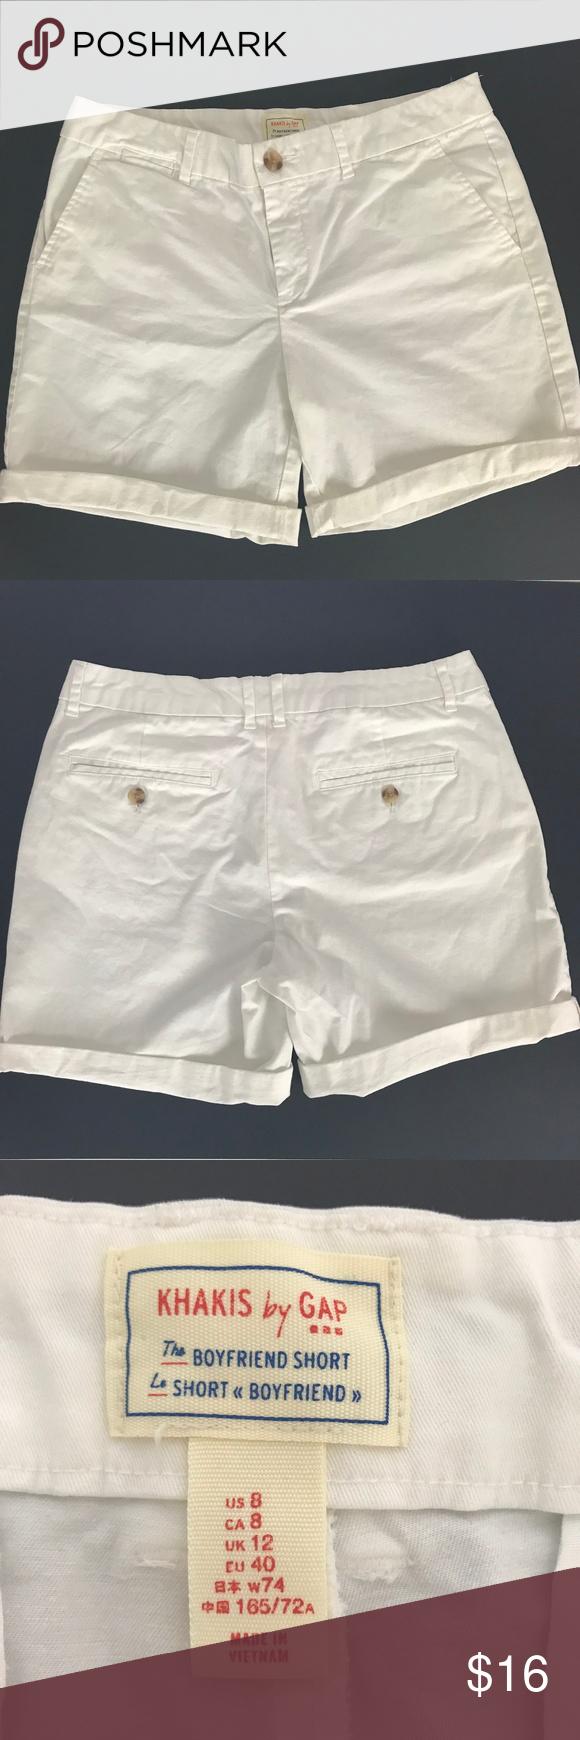 552460f756 Gap Womens Shorts Size 8 Boyfriend Short White Khakis By Gap Size 8 White  Cotton and